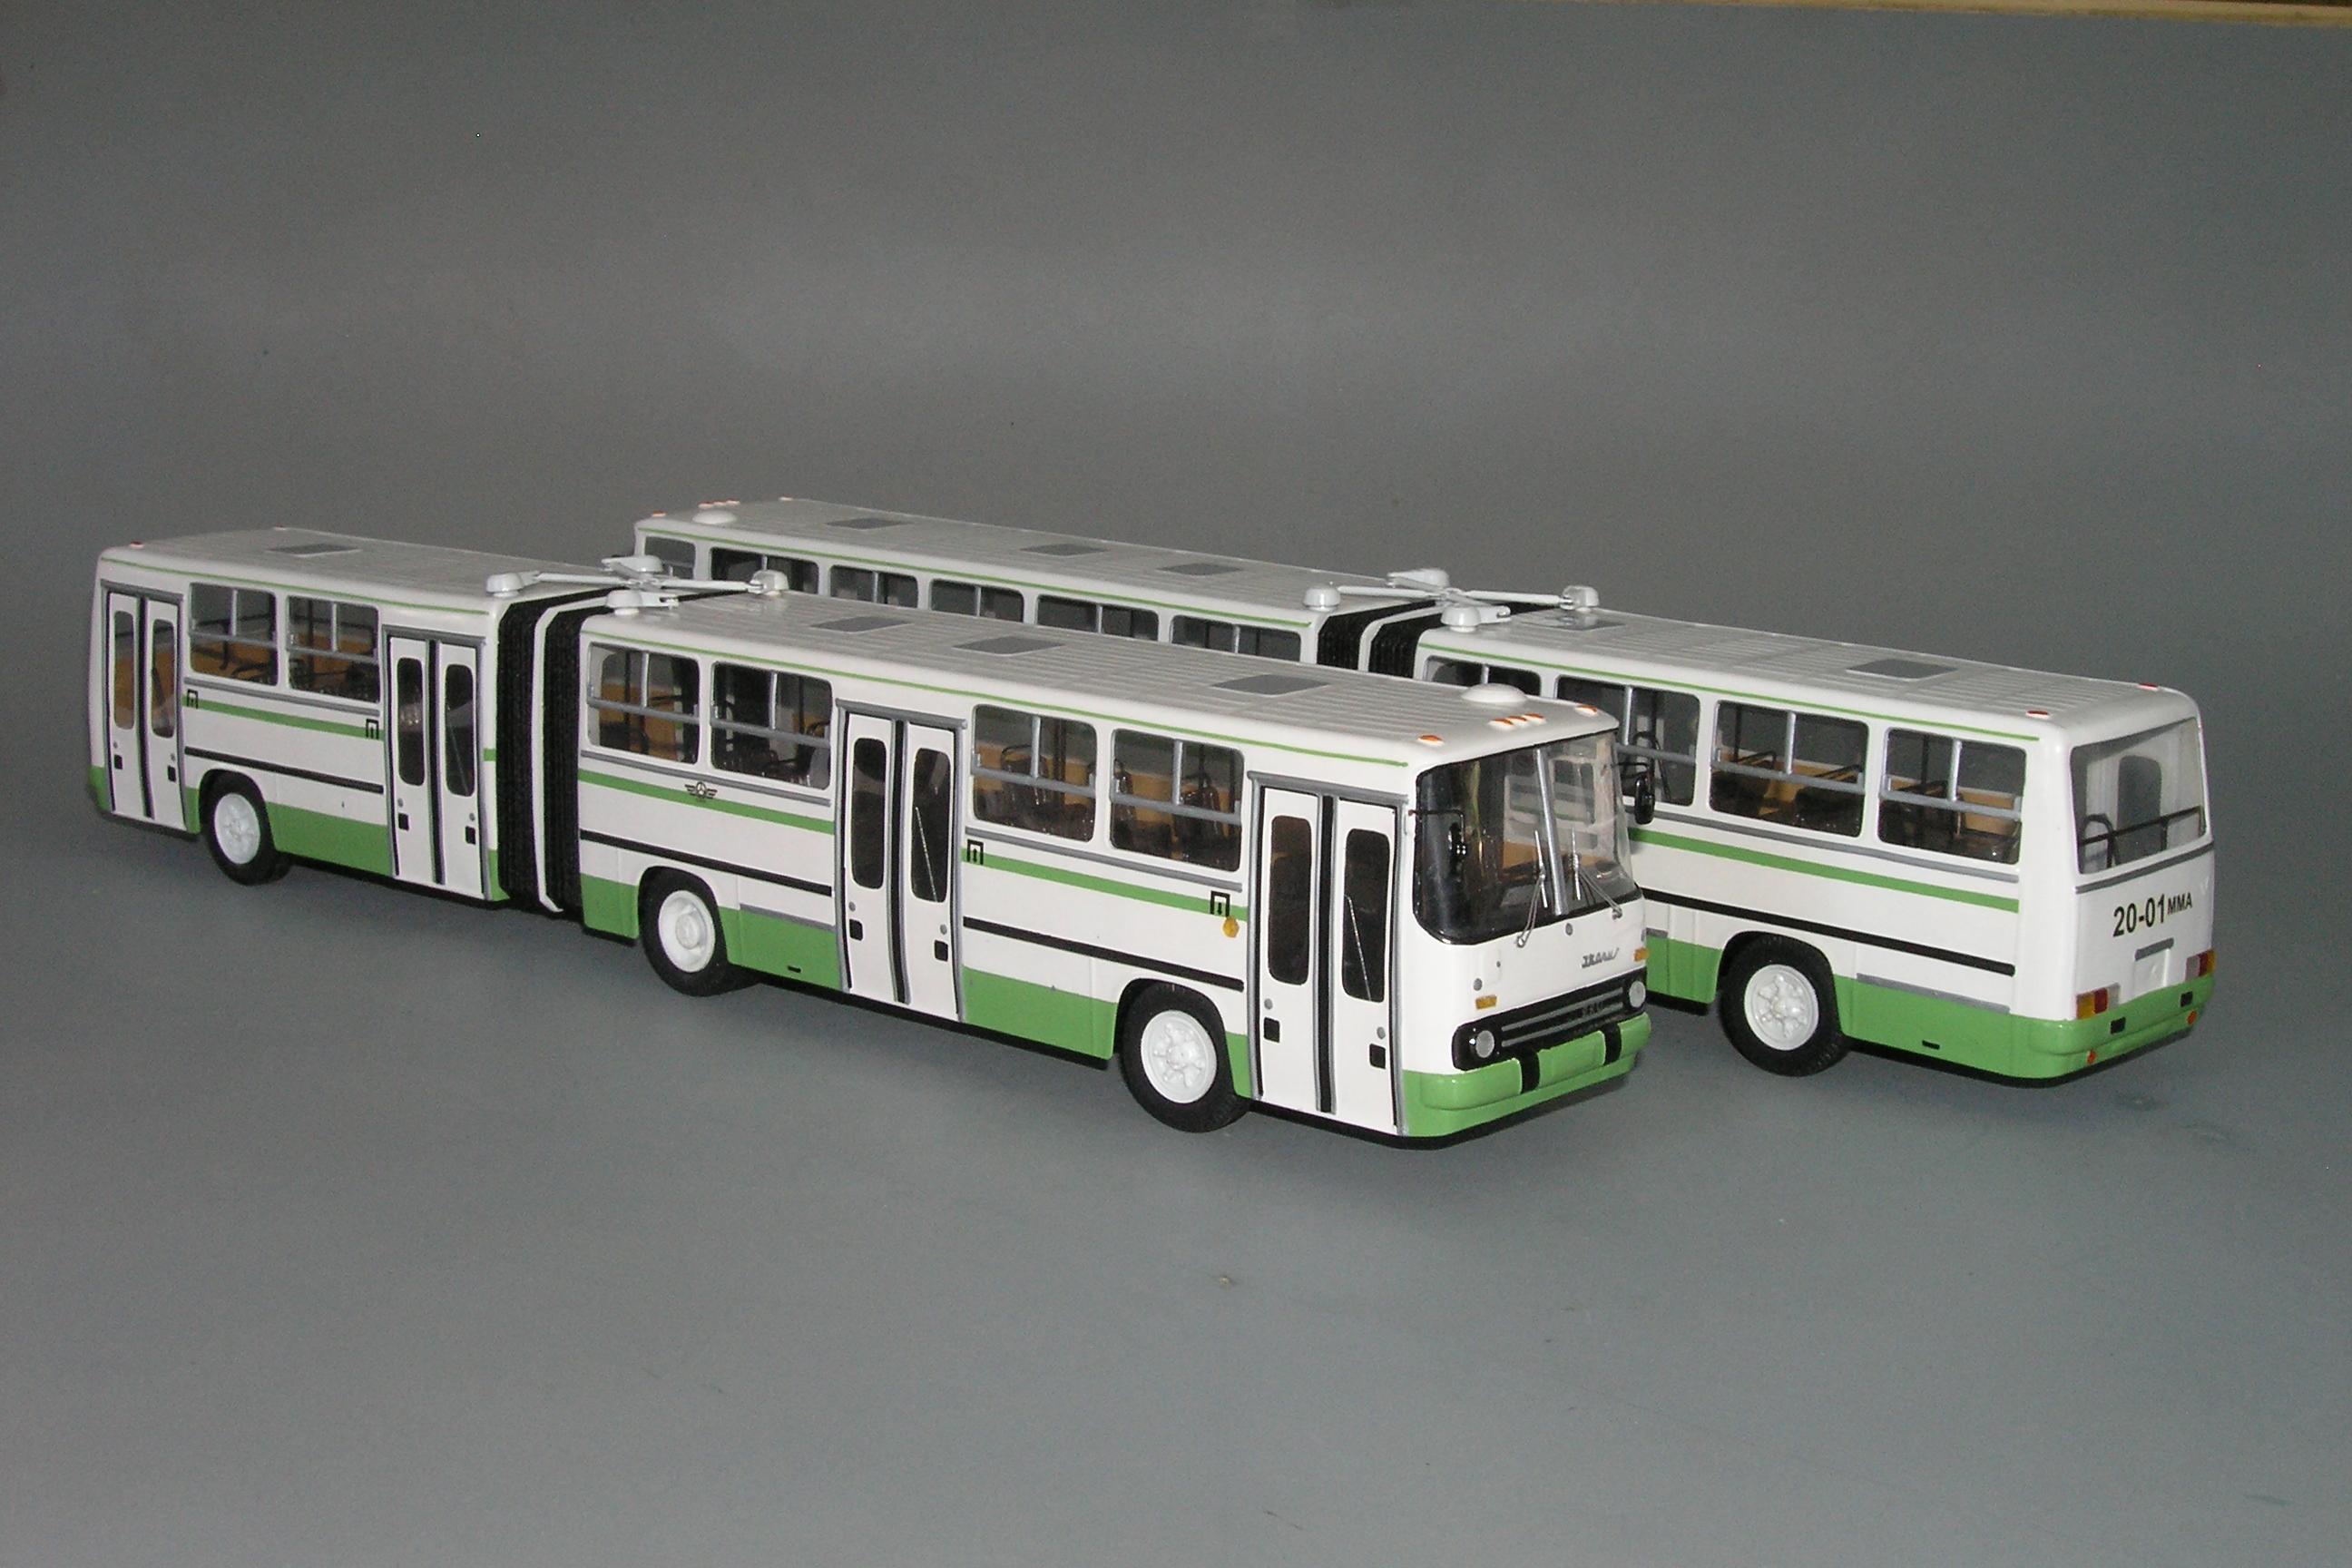 V5-38.1